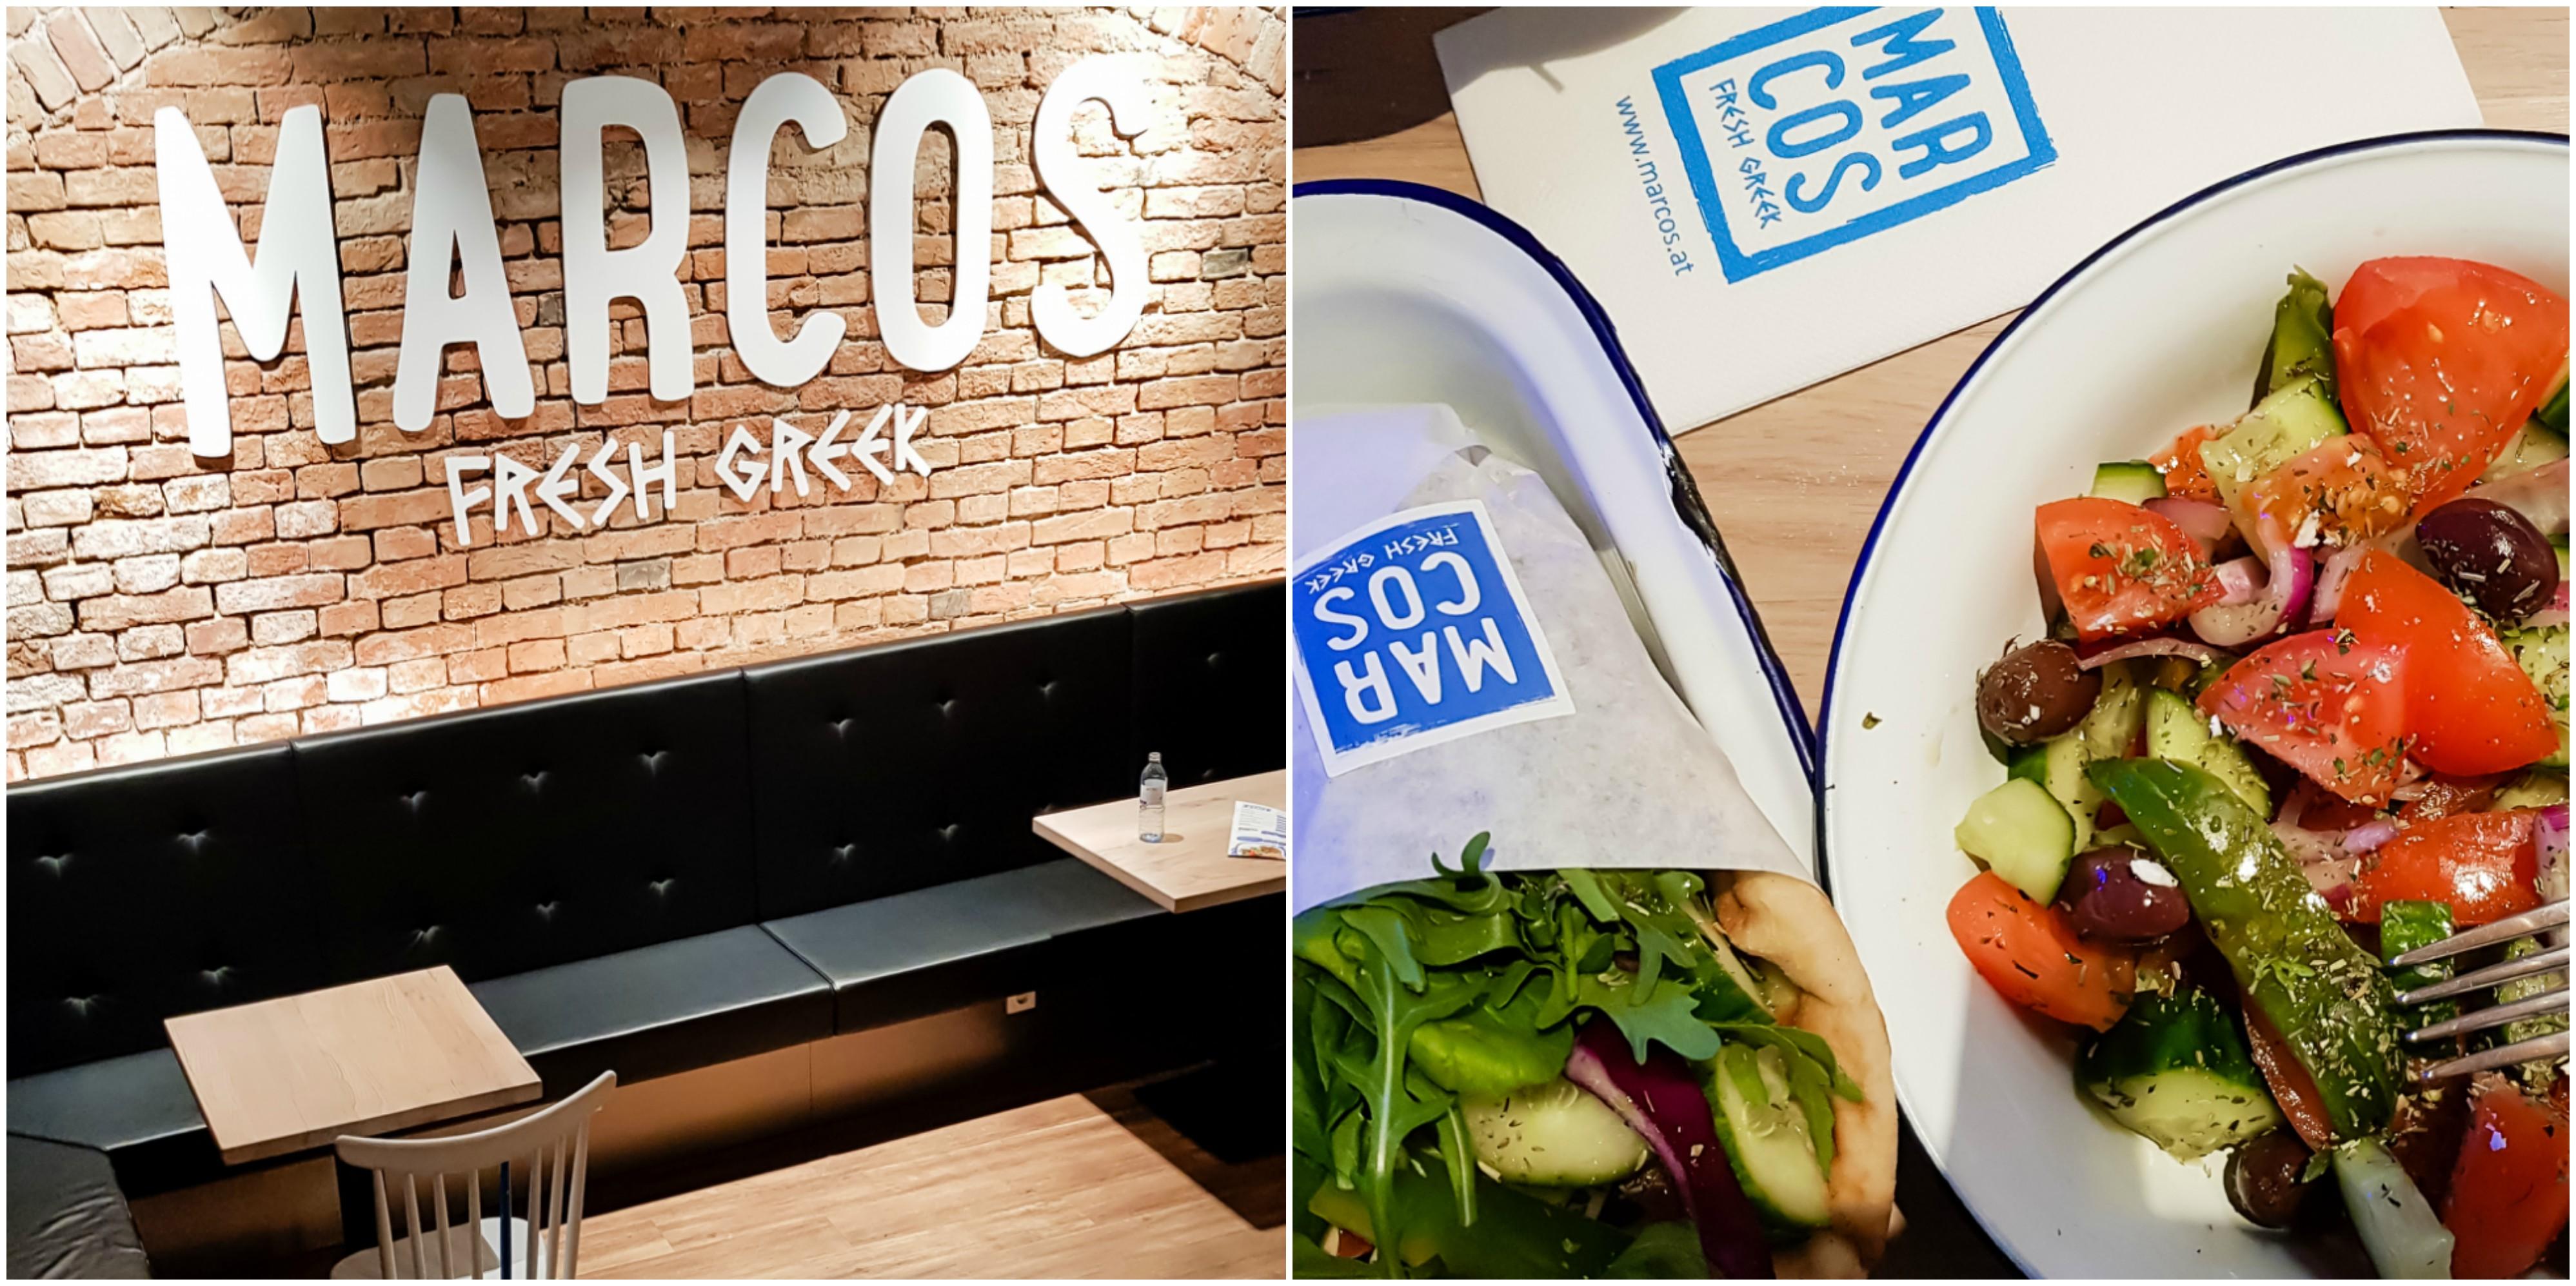 Marcos-fresh-greek-wien-pita-falafel